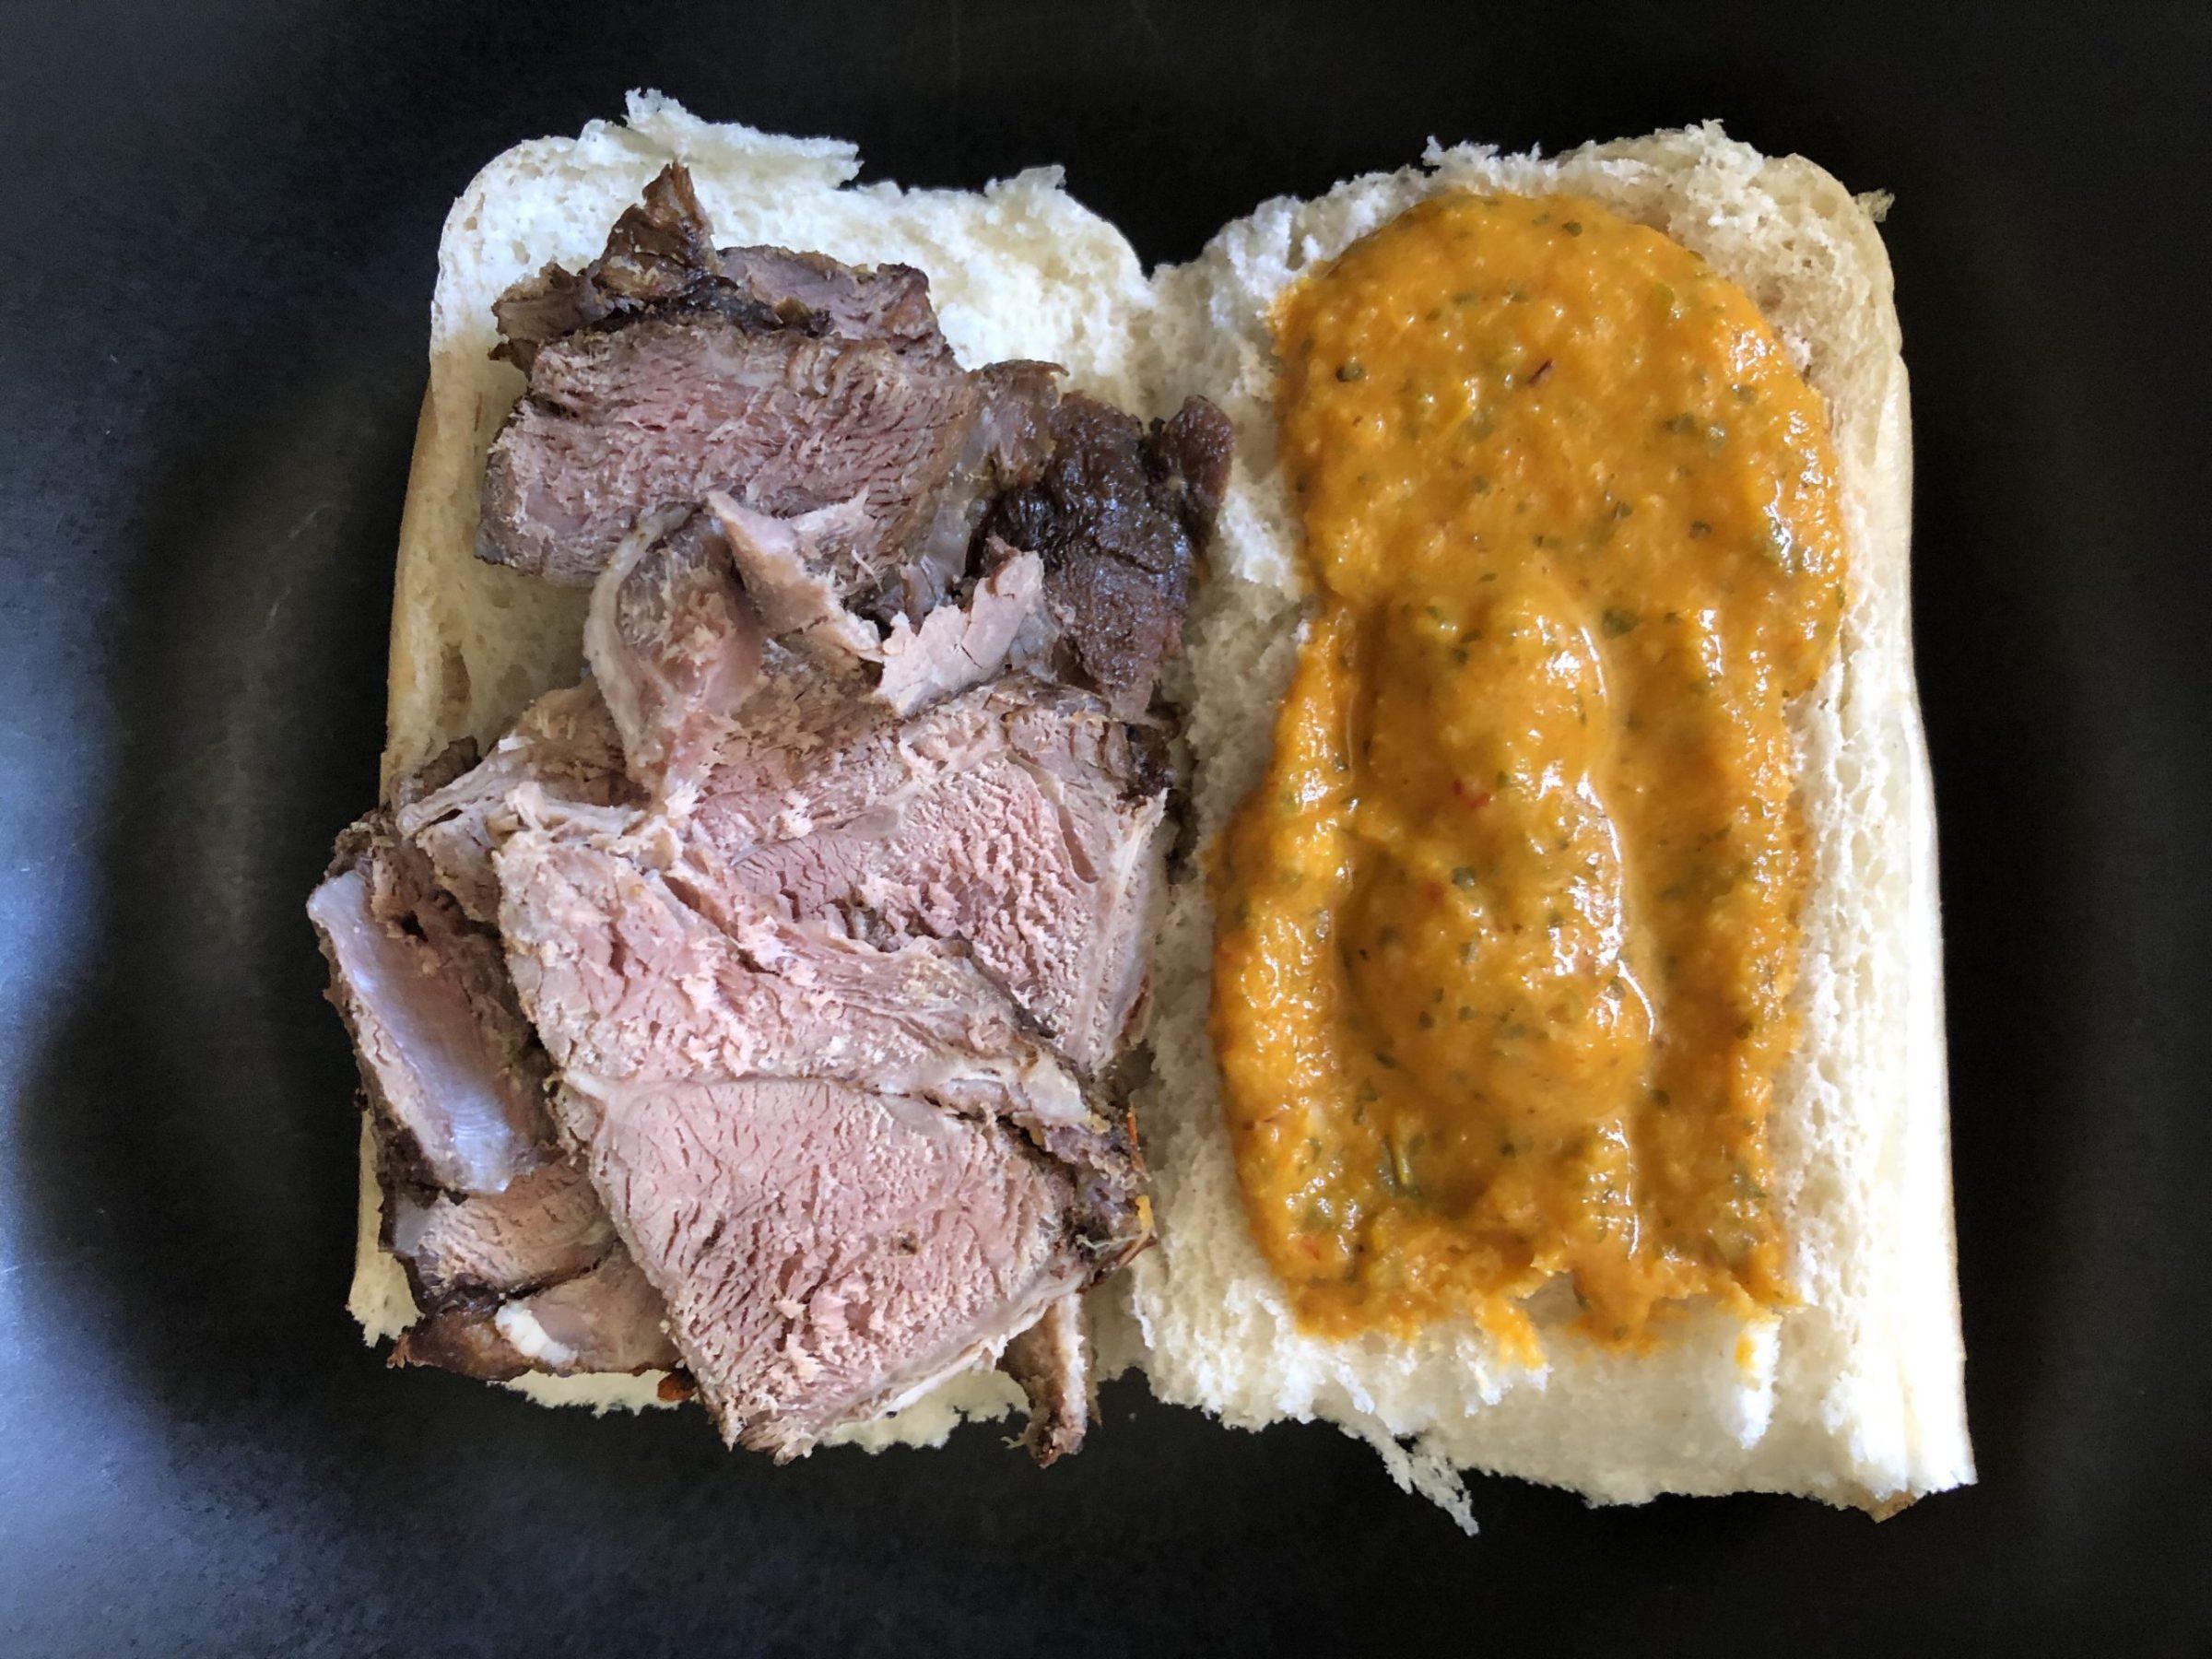 Roast beef sandwich with yellow pepper/cilantro salsa